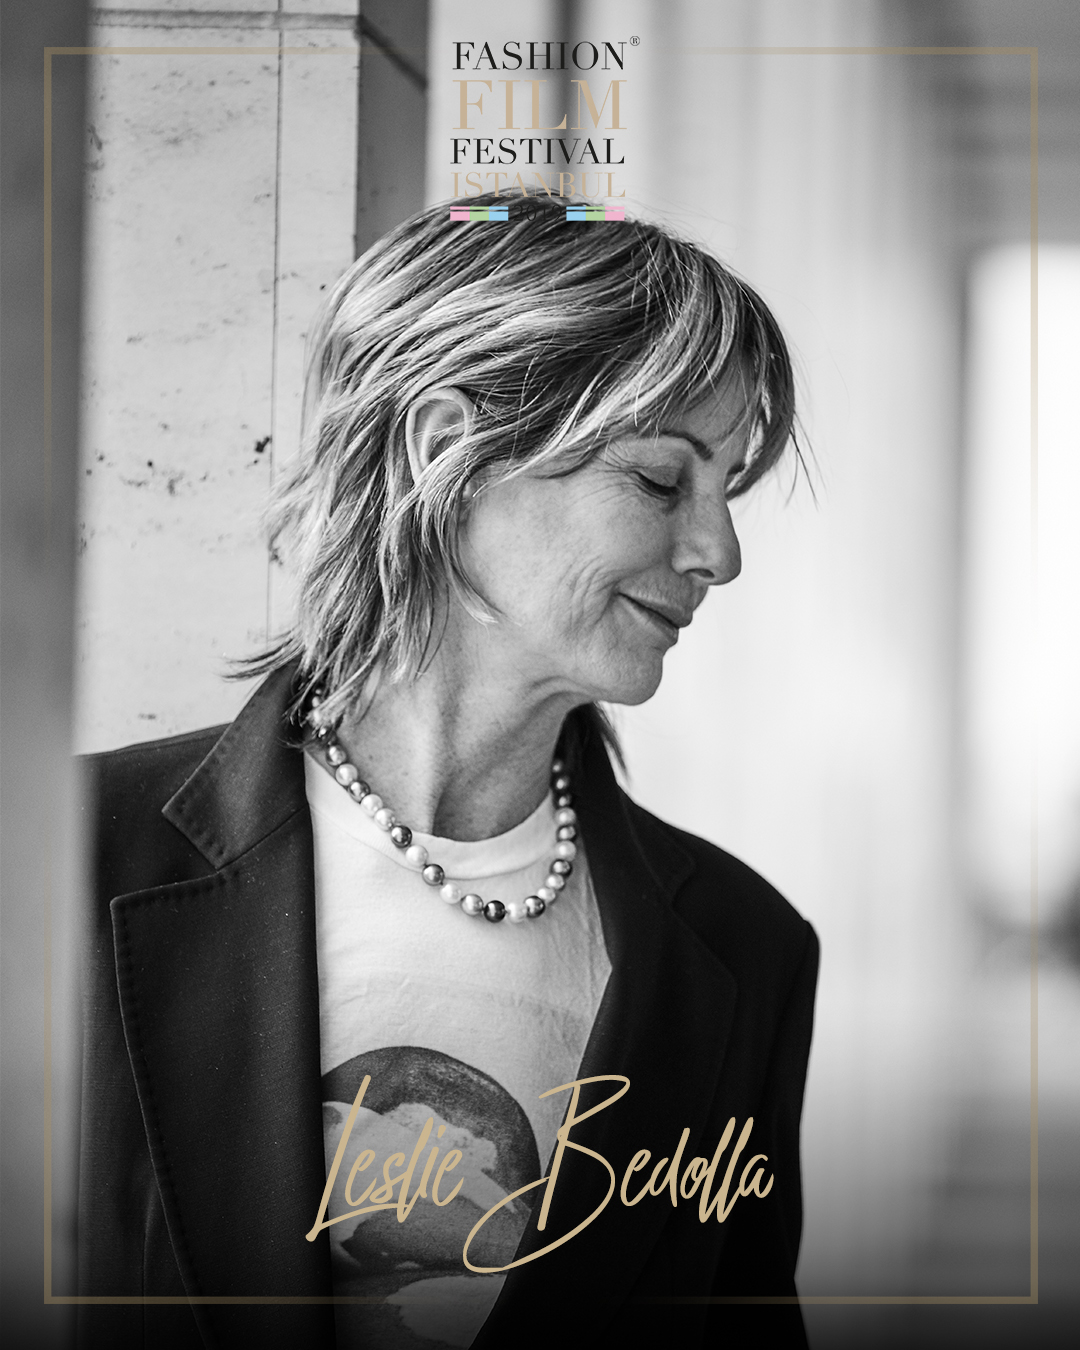 Leslie Bedolla    Co-Founder    Los Angeles Fashion Festival